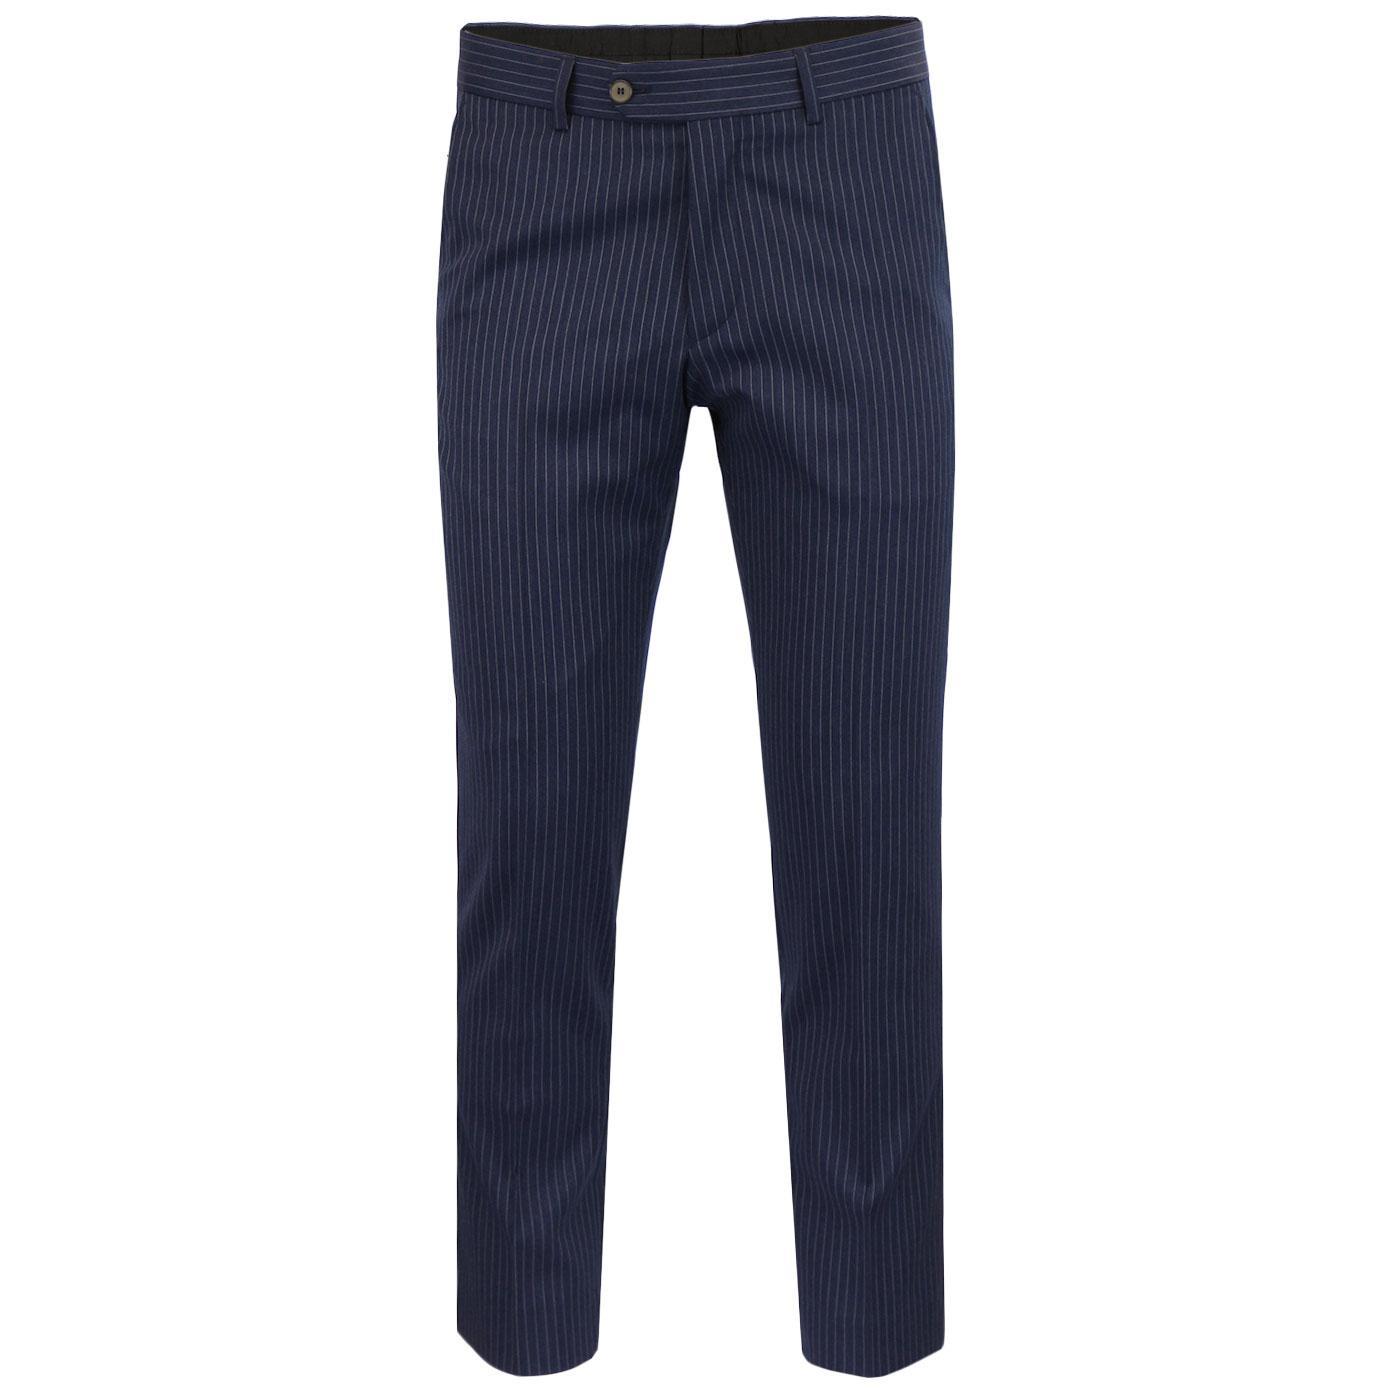 Men's Mod Pinstripe Slim Leg Suit Trousers (Navy)